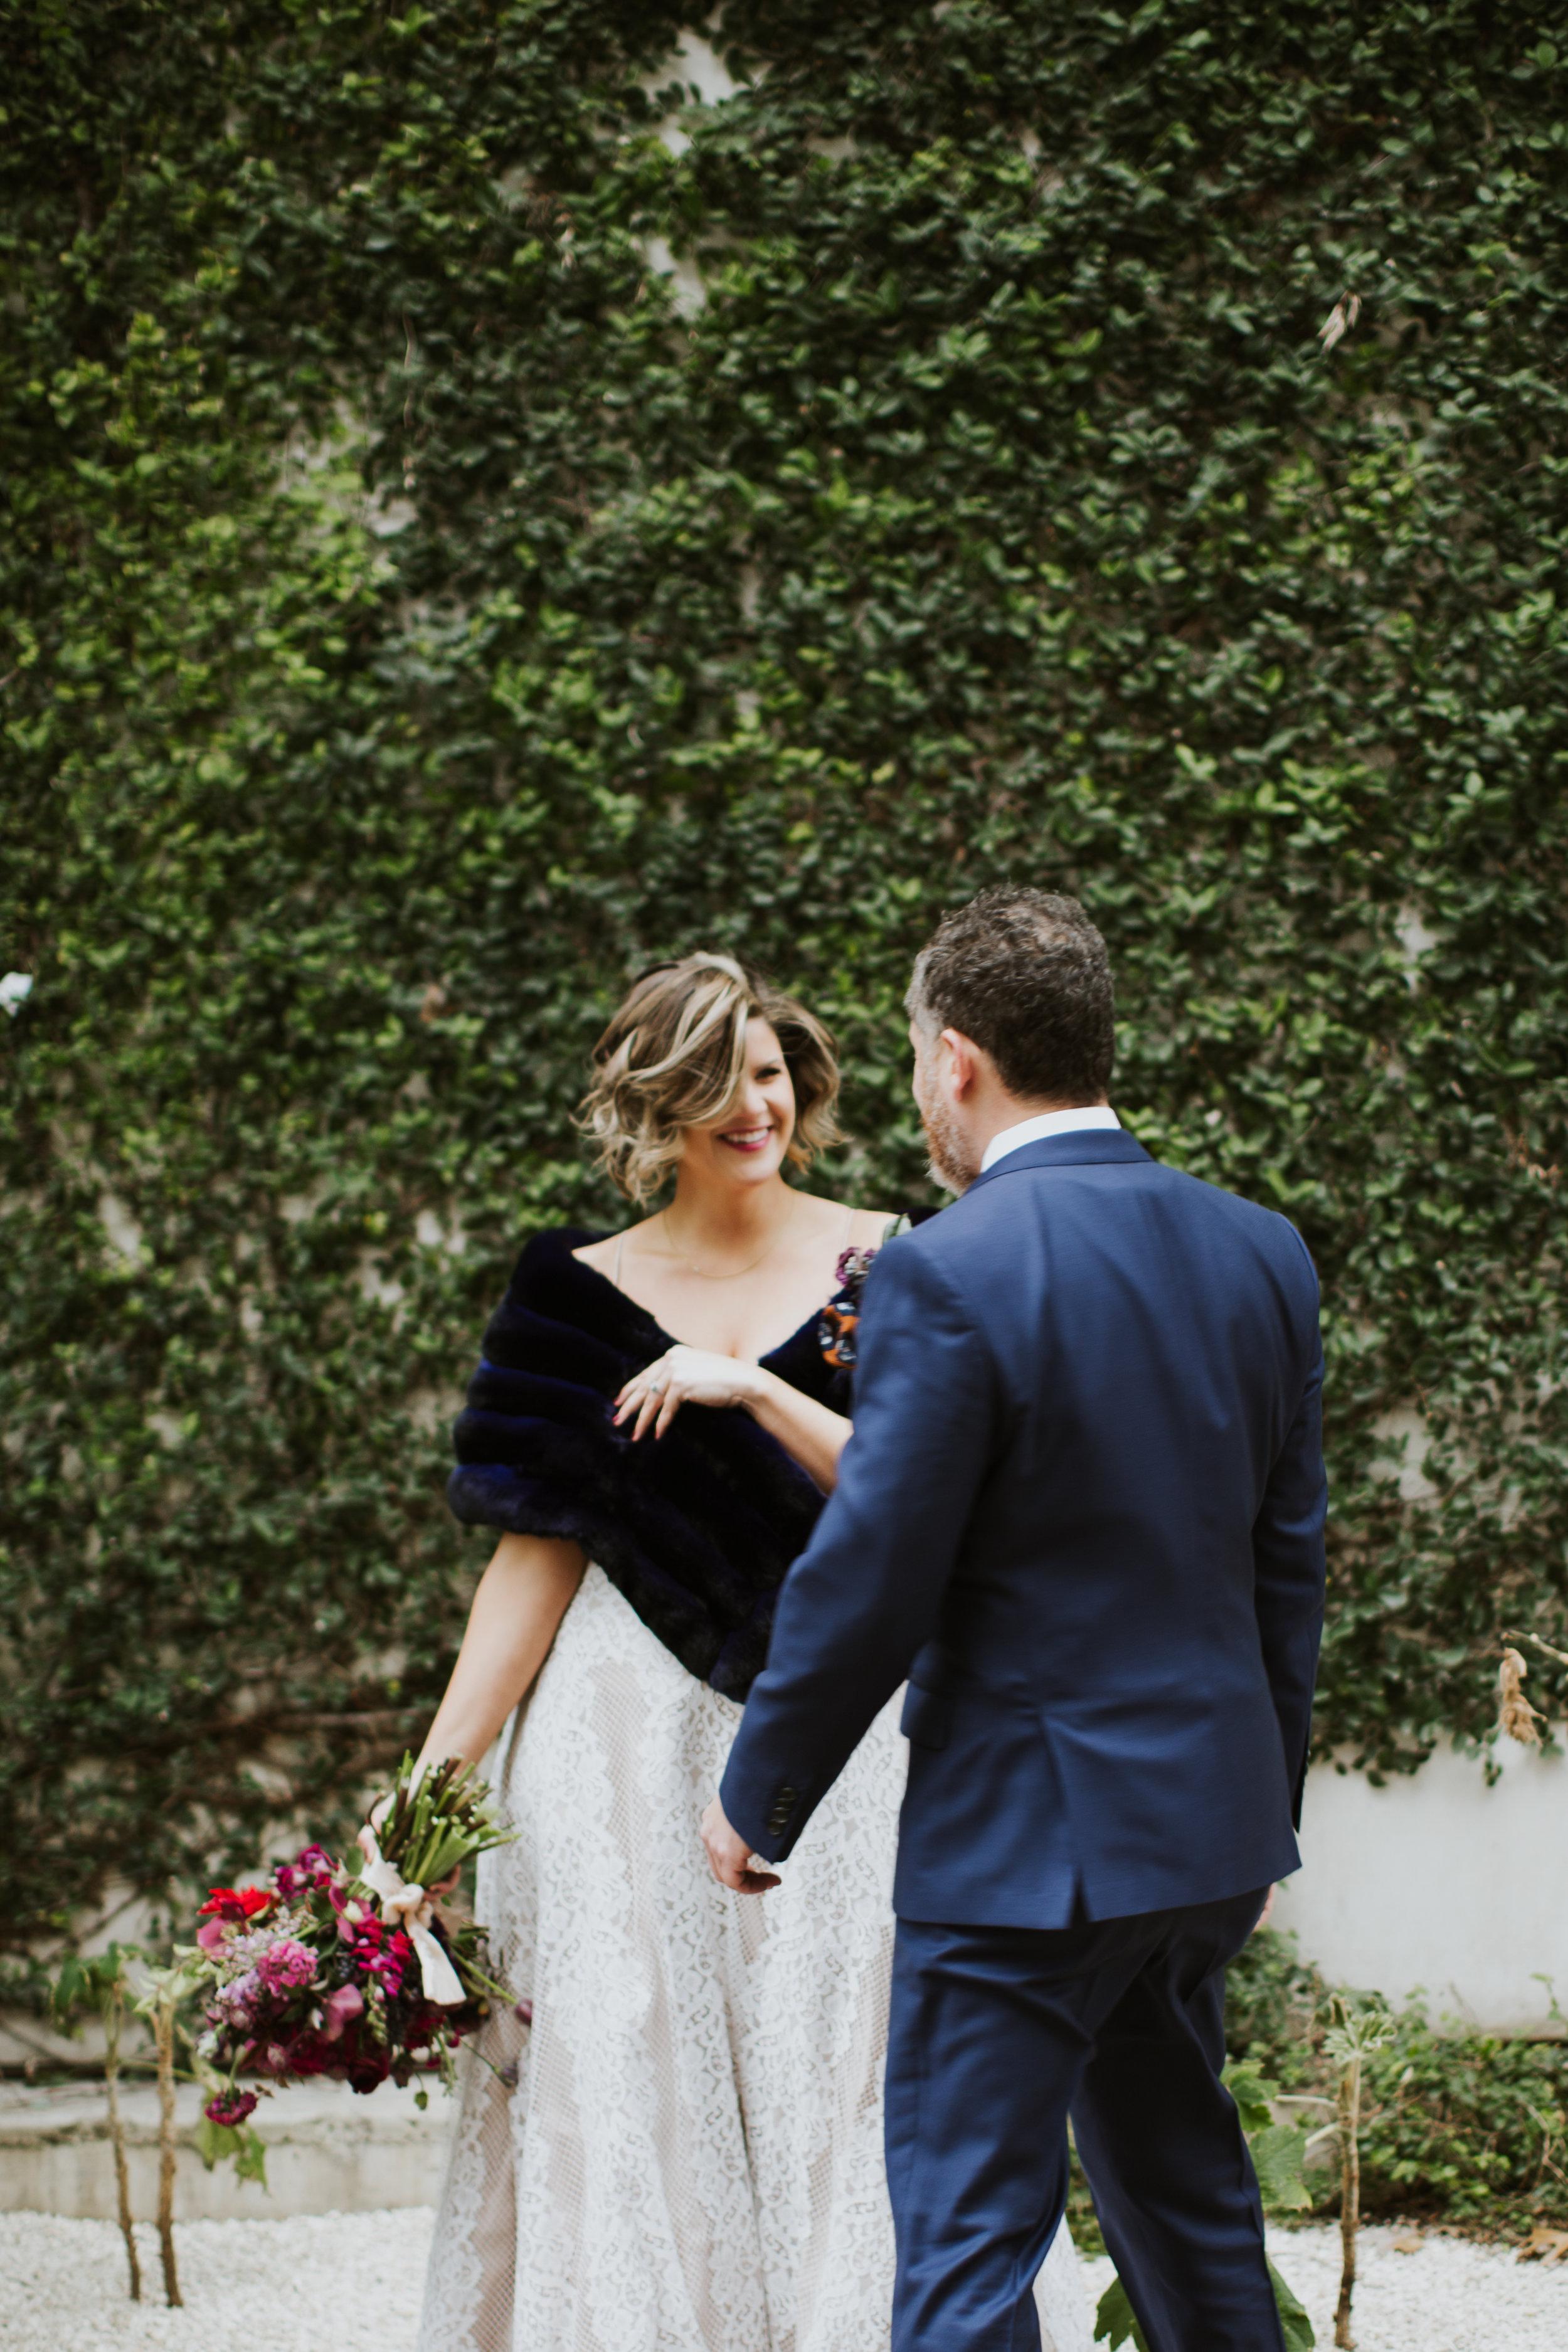 Paige-Newton-Intimate-Wedding-Photography-Malverde-Wedding.jpg